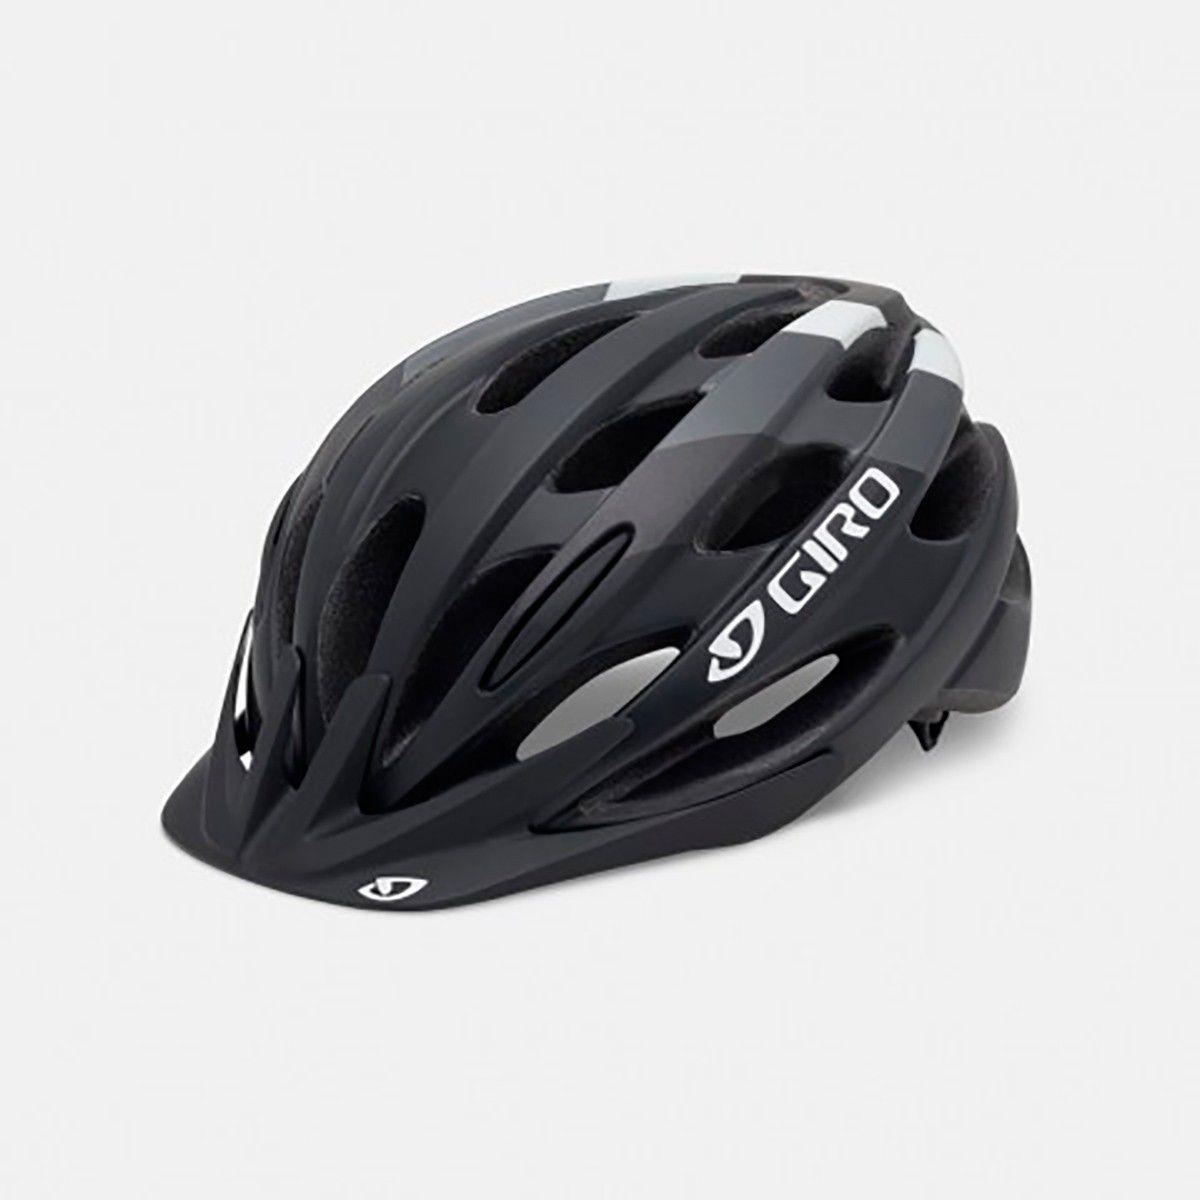 Capacete De Ciclismo Mtb Giro Revel